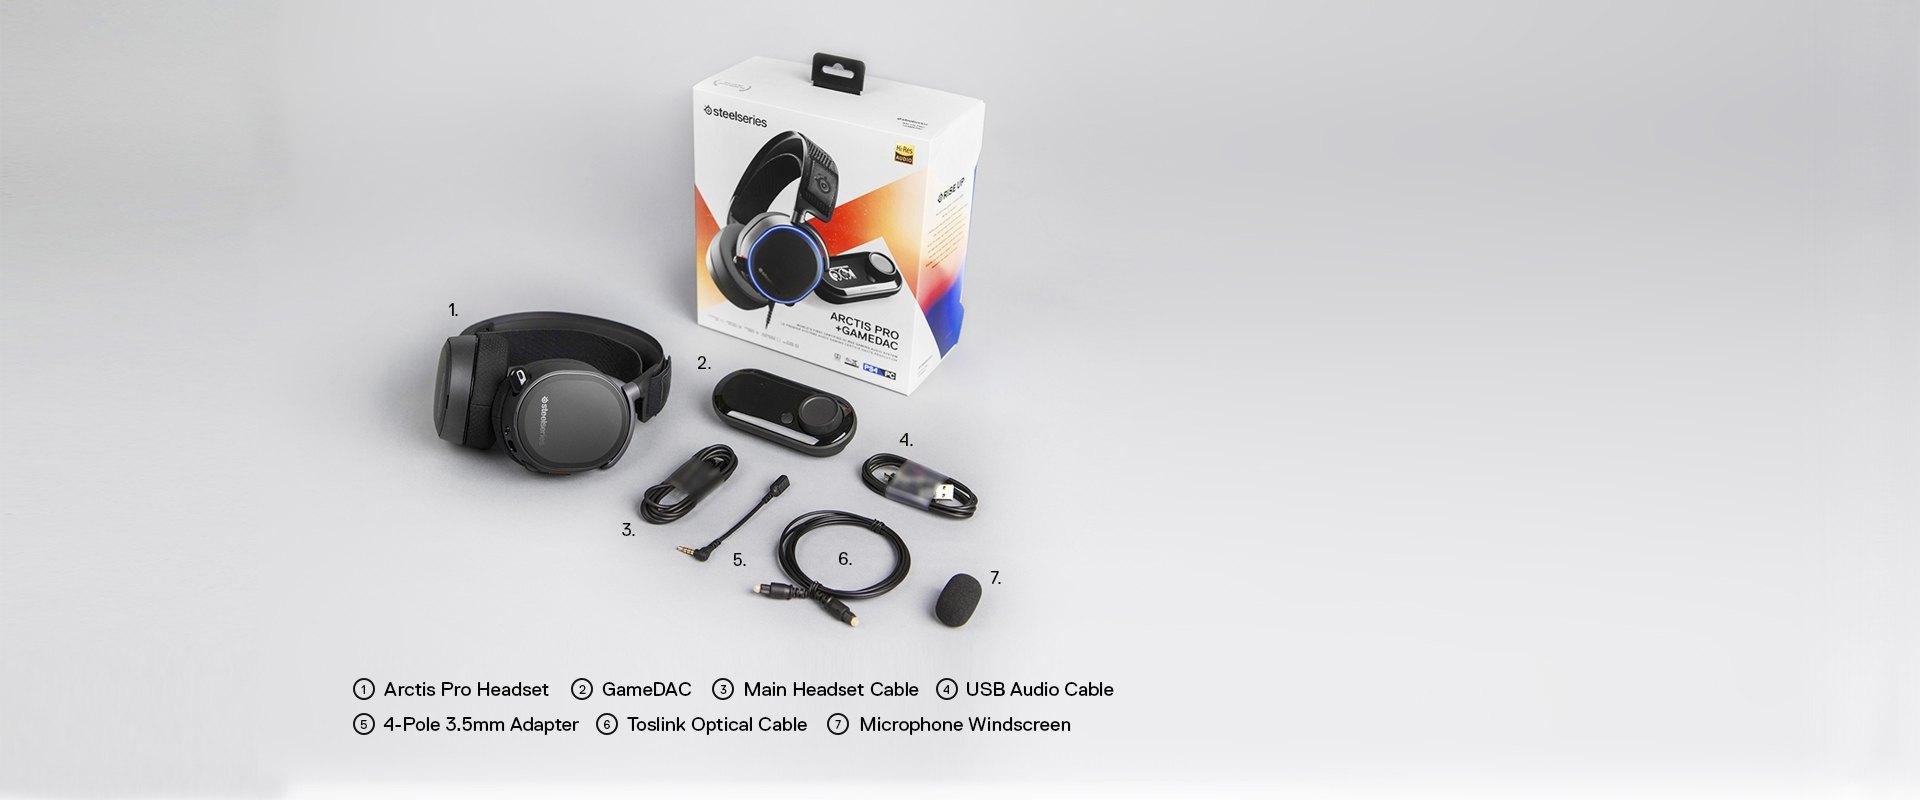 Arctis Pro 包裝以及標明的包裝盒內物品